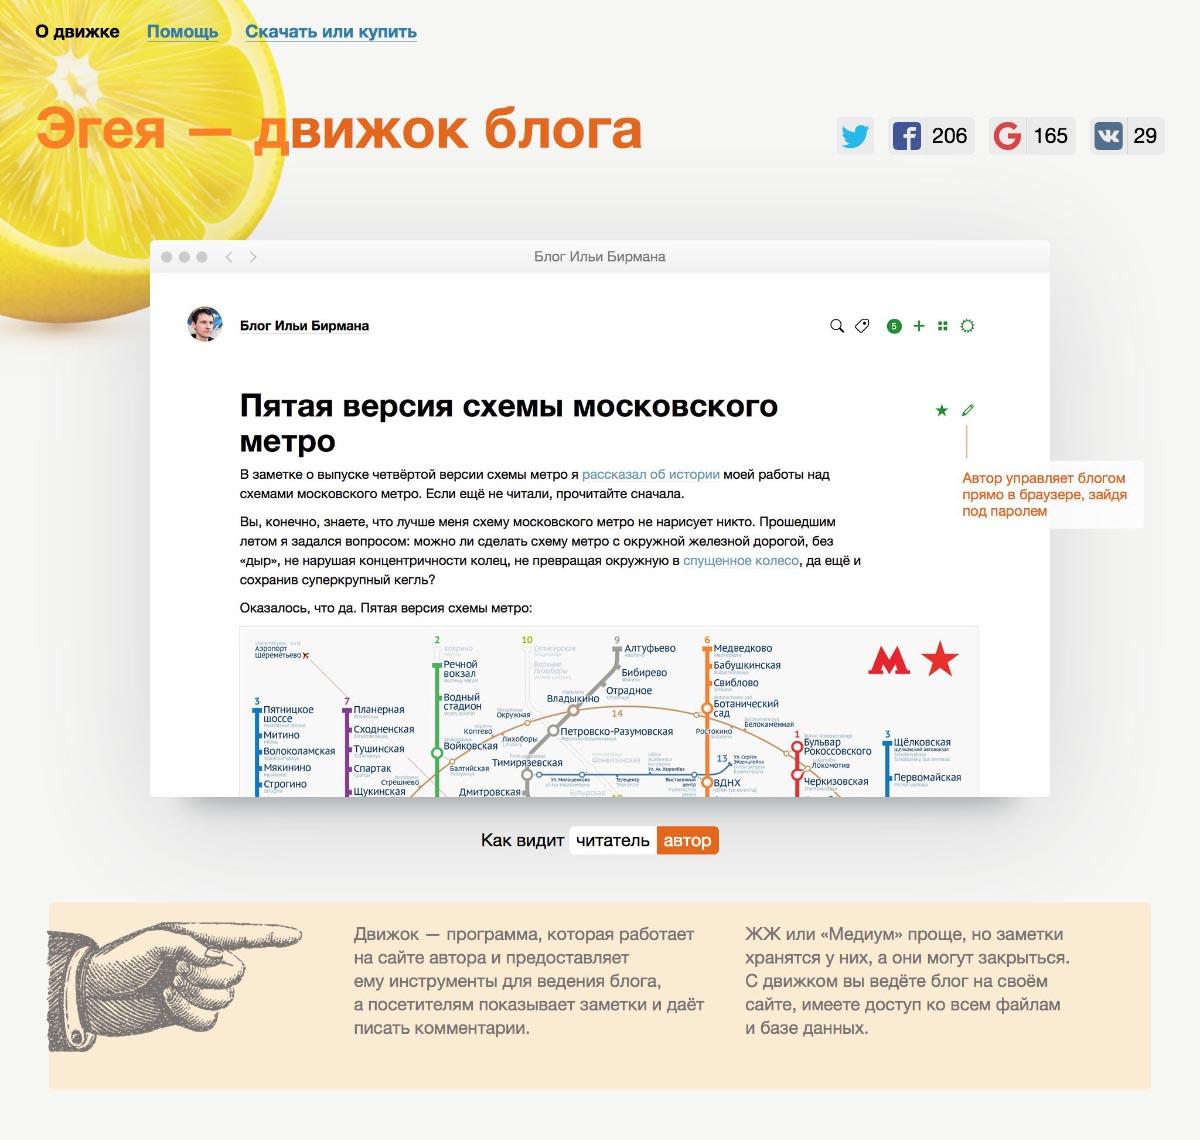 Новый сайт Эгеи